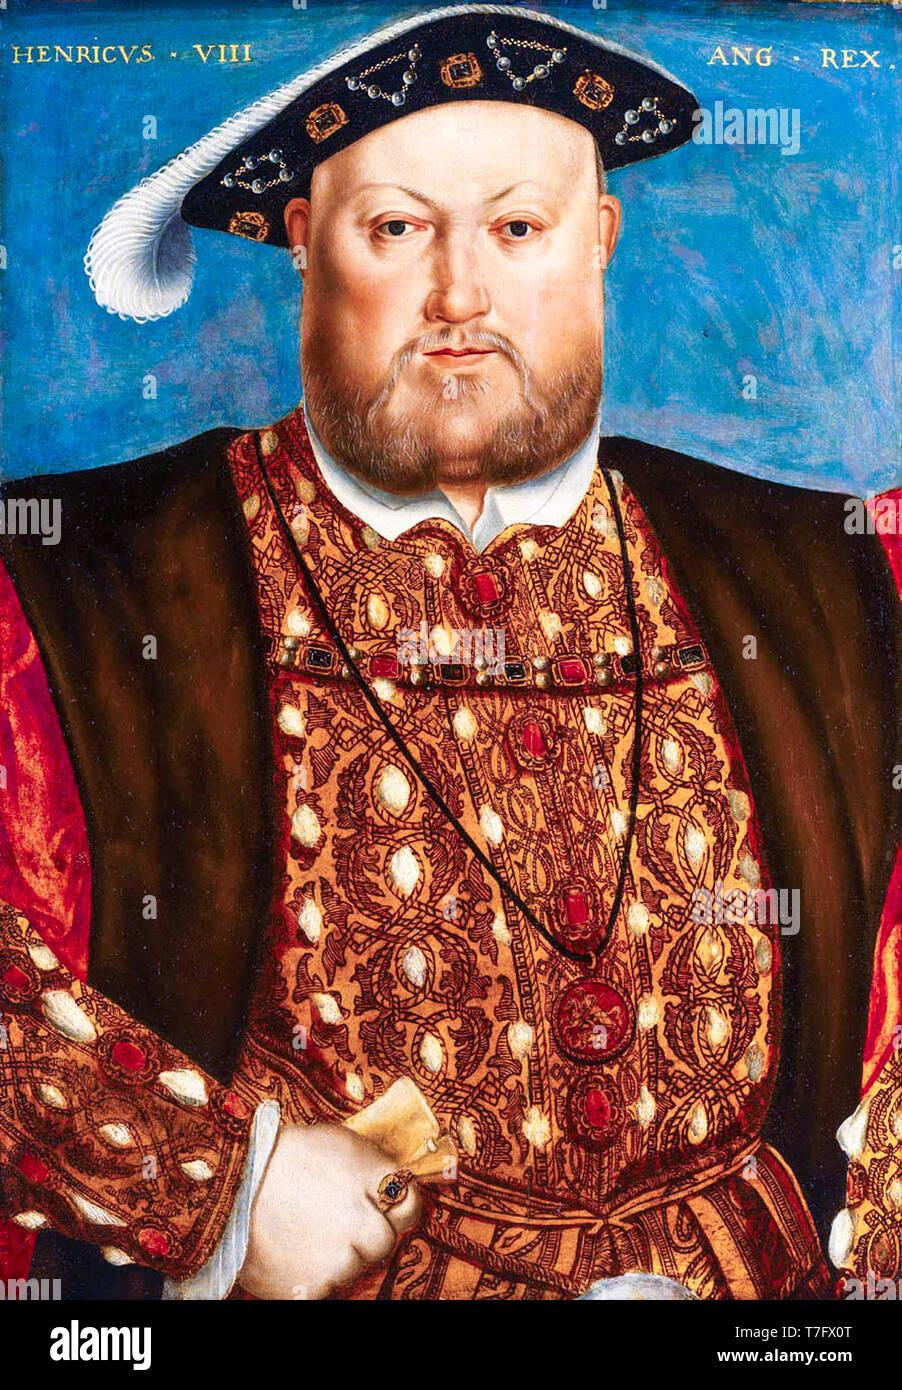 König Henry VIII (1491-1547) Portrait Malerei, Nachdem Hans Holbein, 16. Jahrhundert Stockfoto